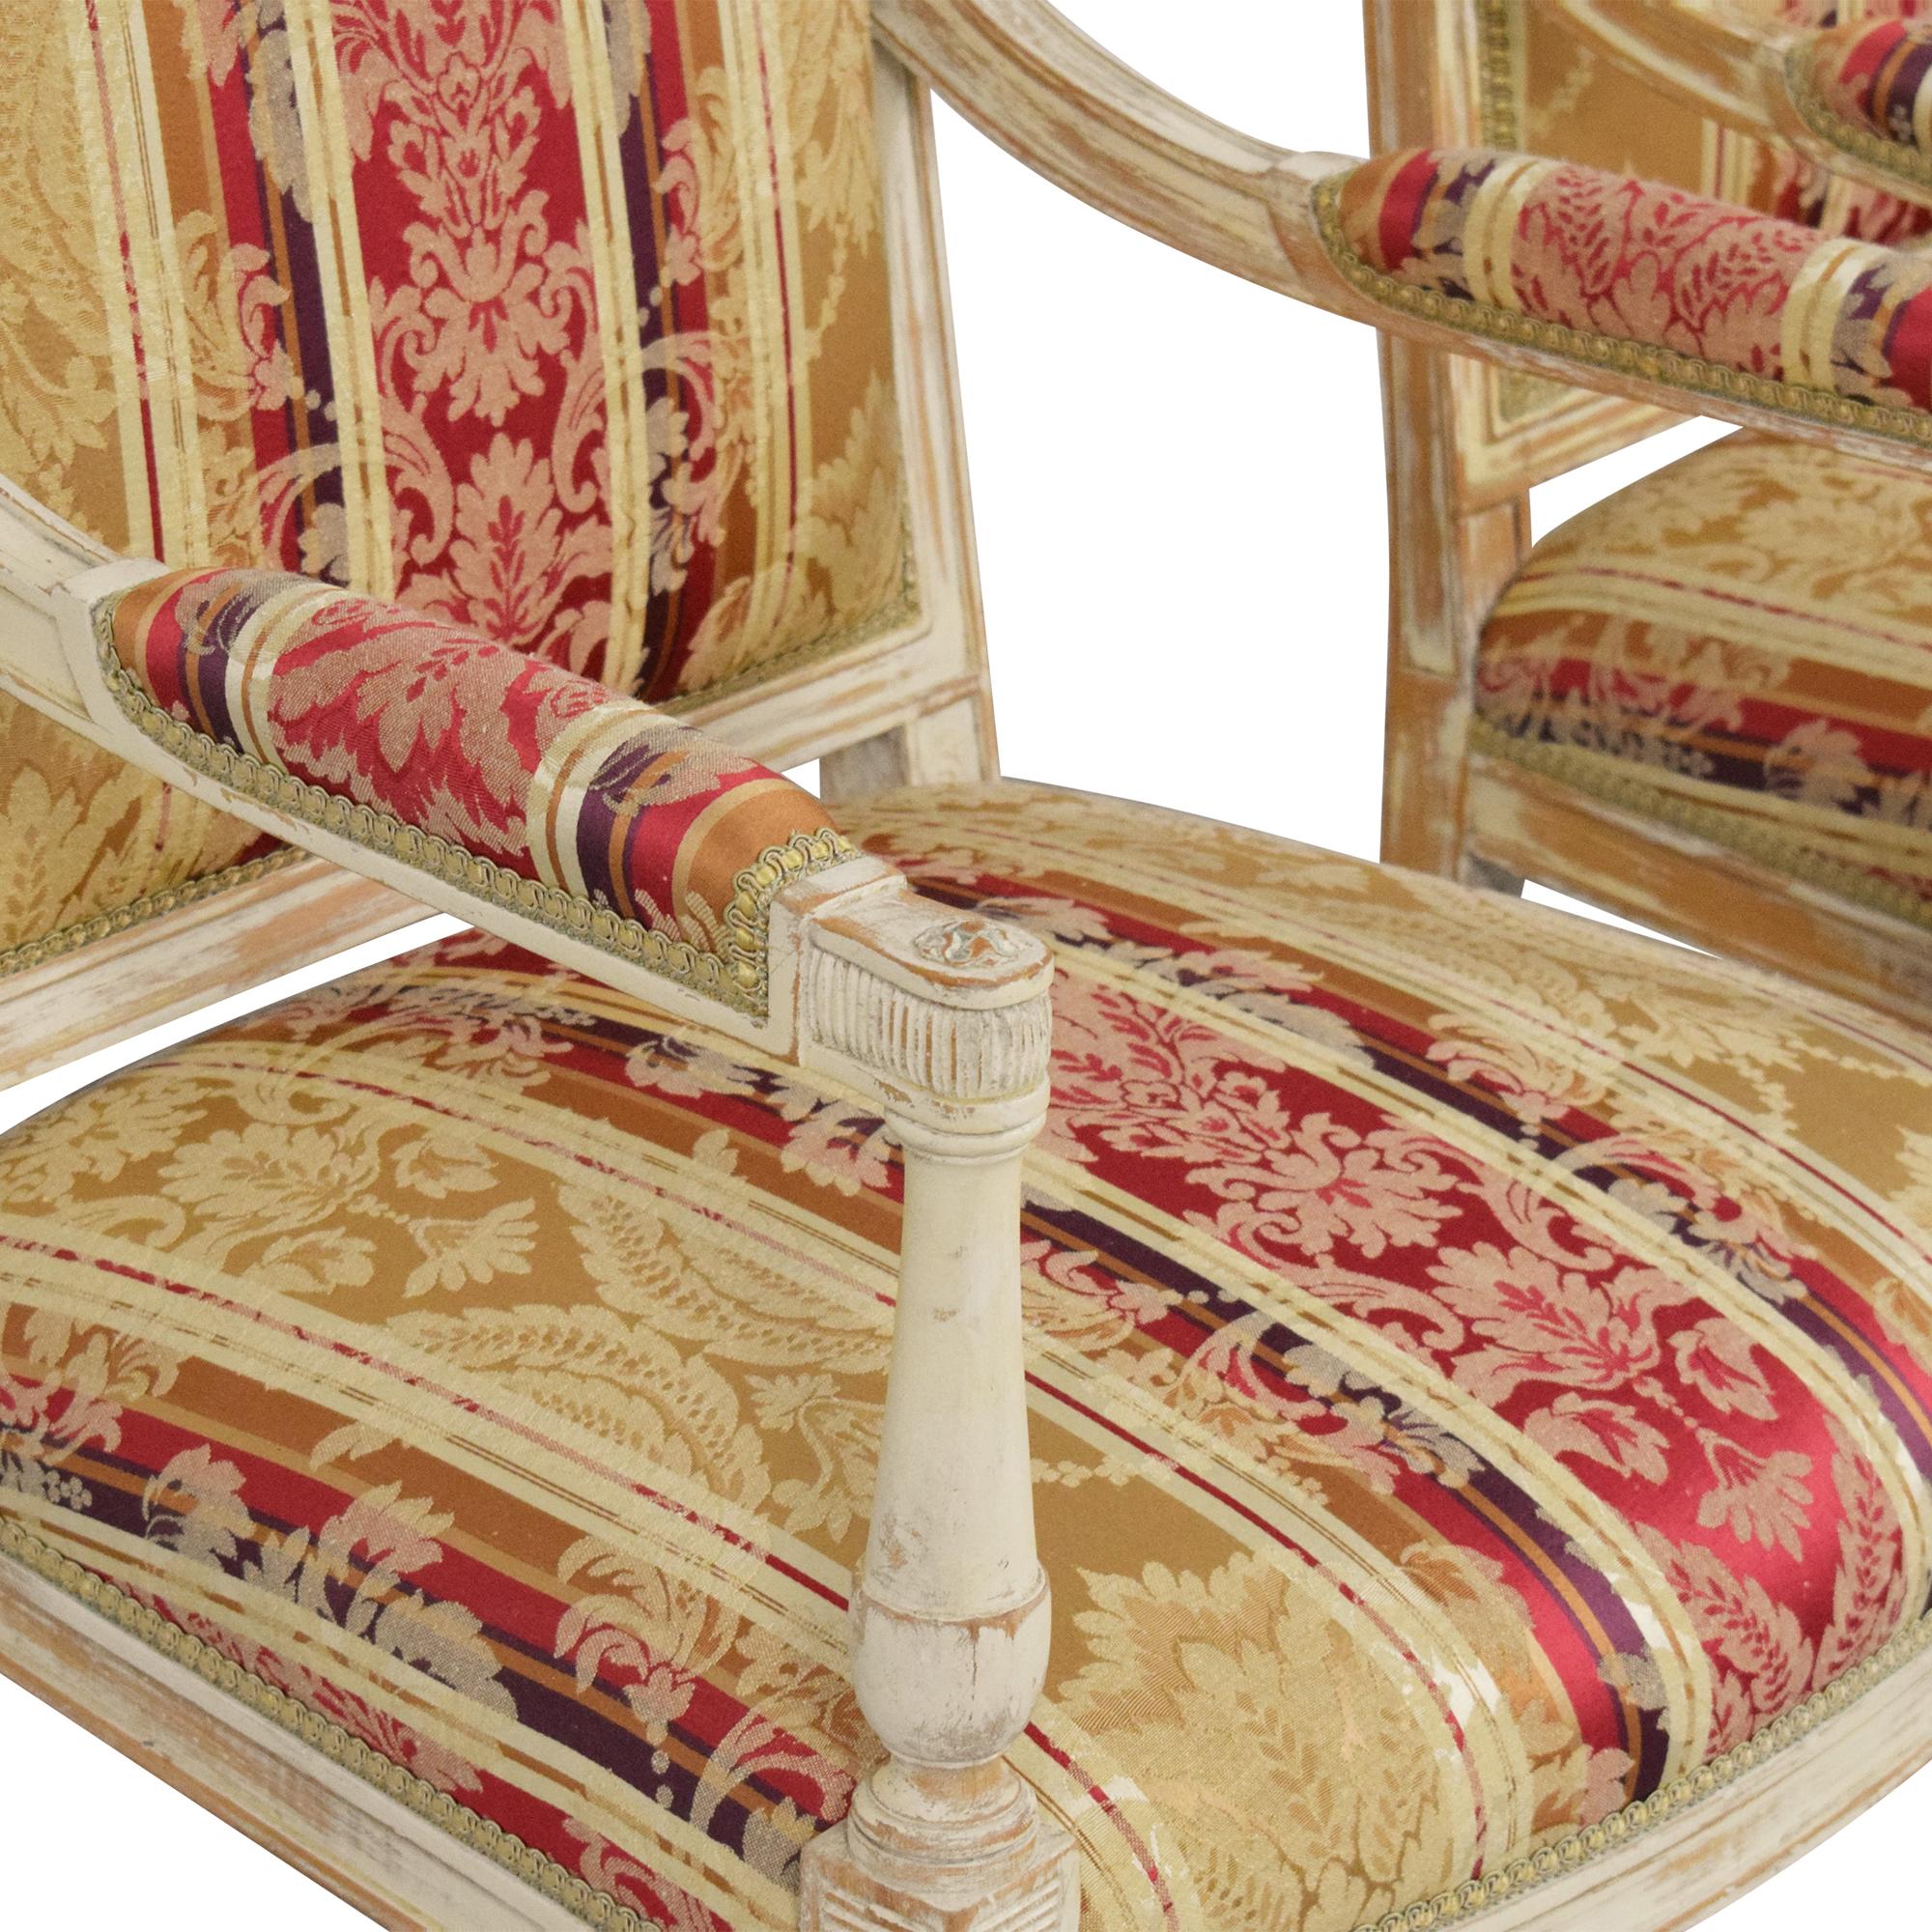 ABC Carpet & Home ABC Carpet & Home Louis XVI Style Chairs discount